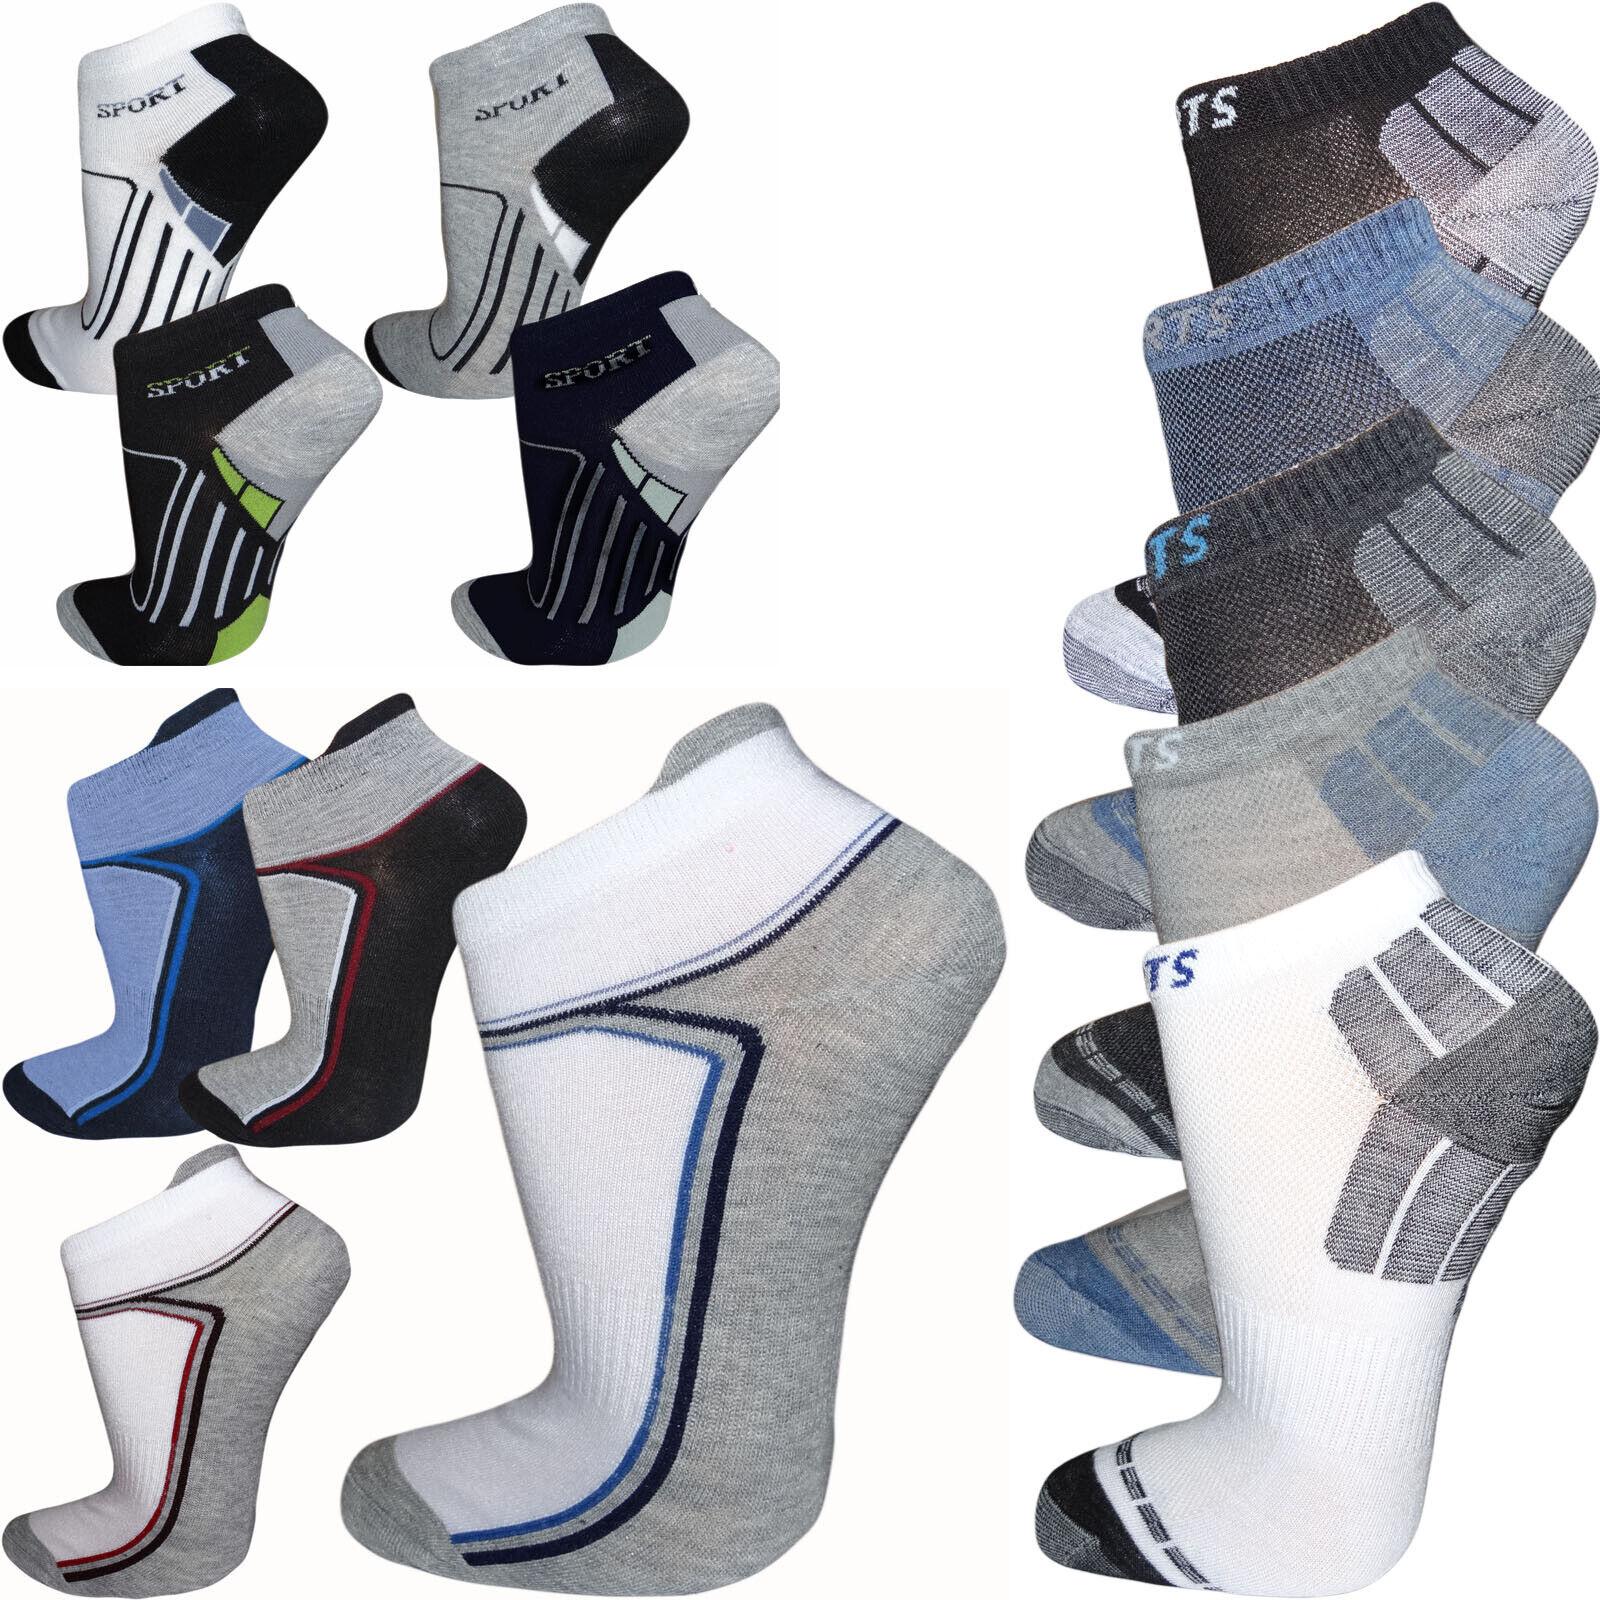 Sneaker Socken Jungen 39 42 Vergleich Test +++ Sneaker